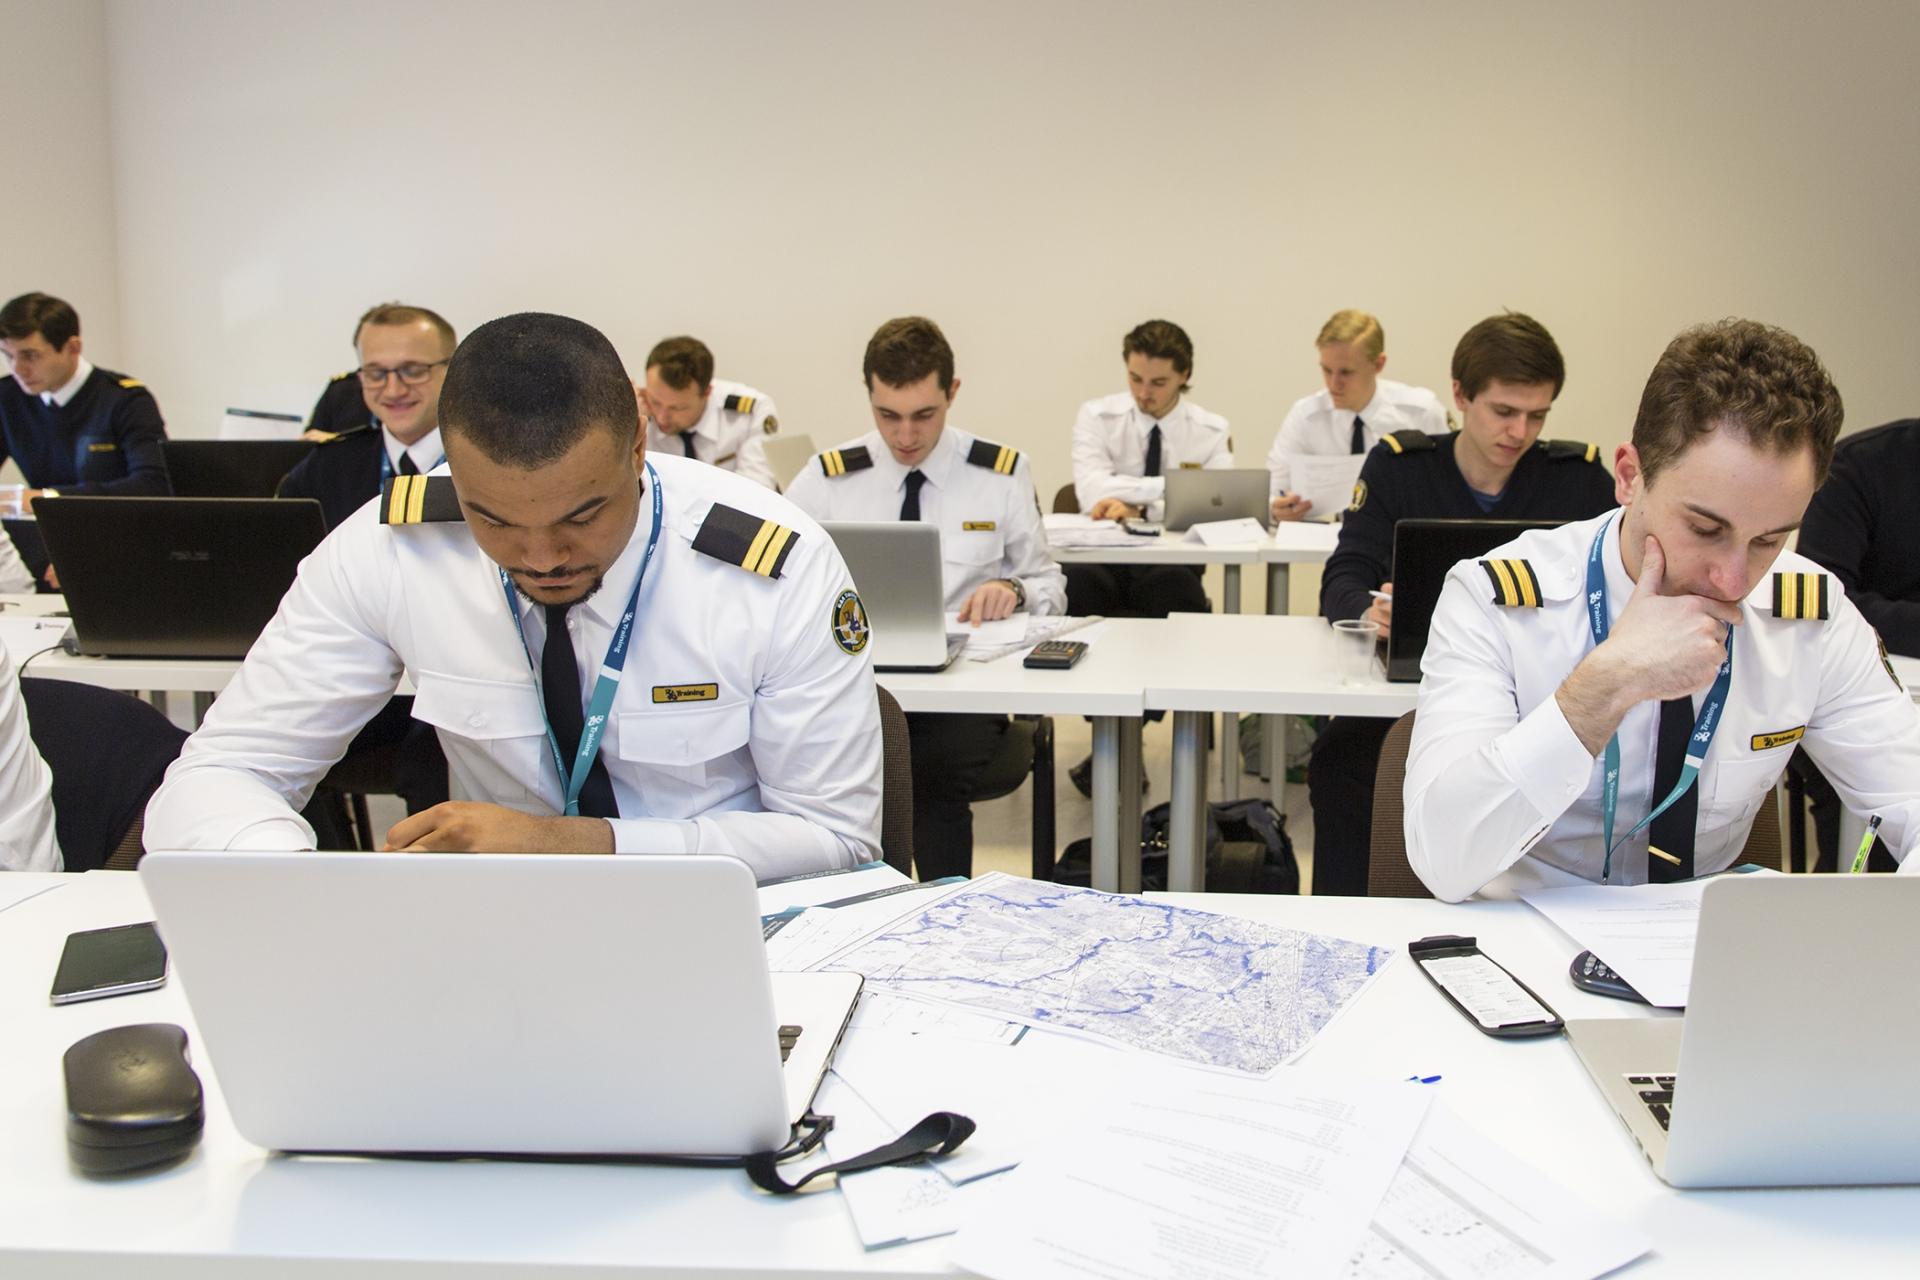 BAA Training establishes pilot training facility in Ho Chi Minh City